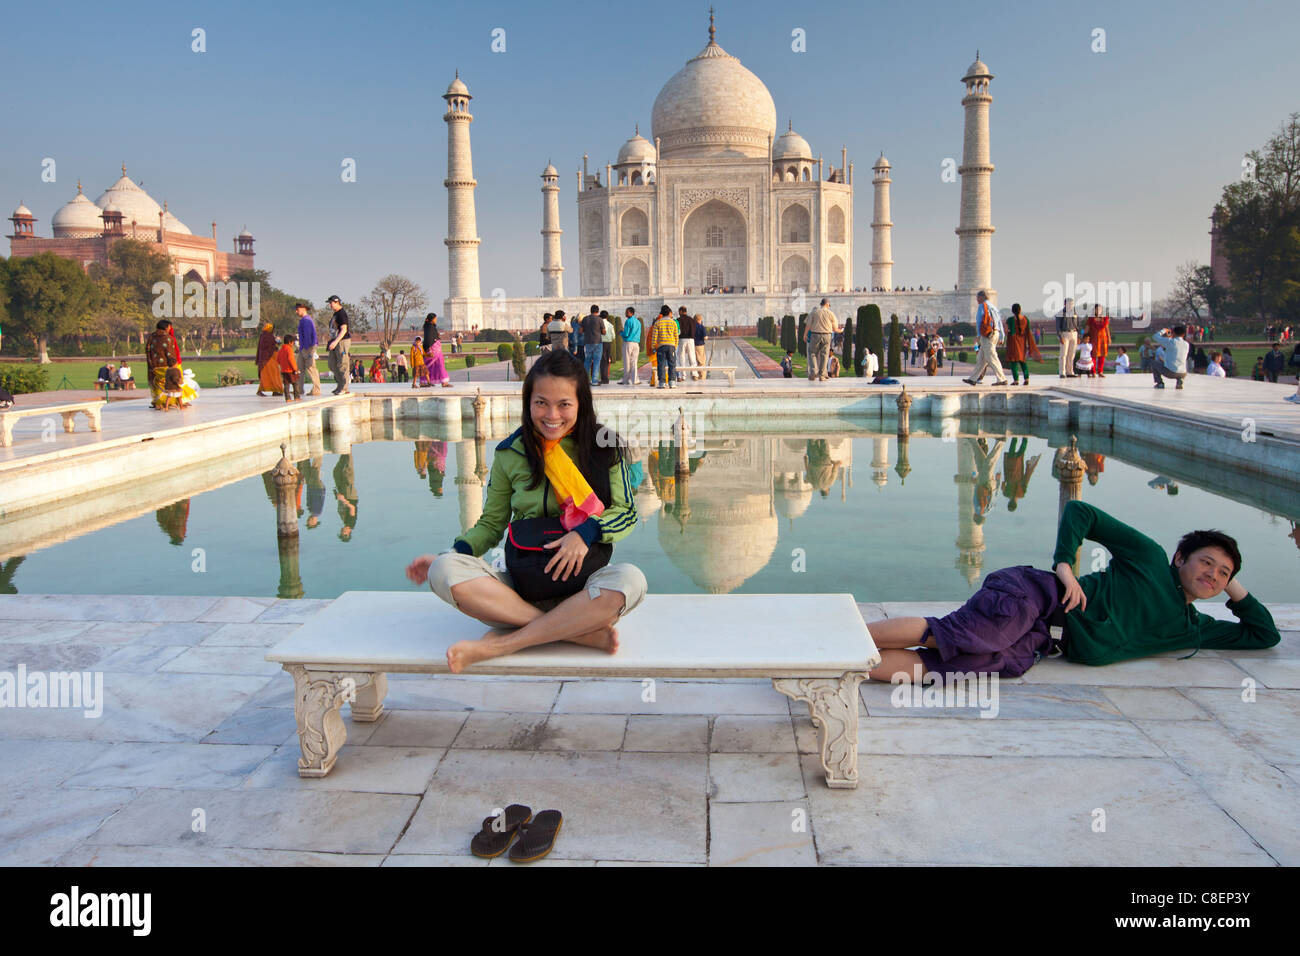 Tourists sit on Diana bench at The Taj Mahal mausoleum southern view with reflecting pool, Uttar Pradesh, India - Stock Image